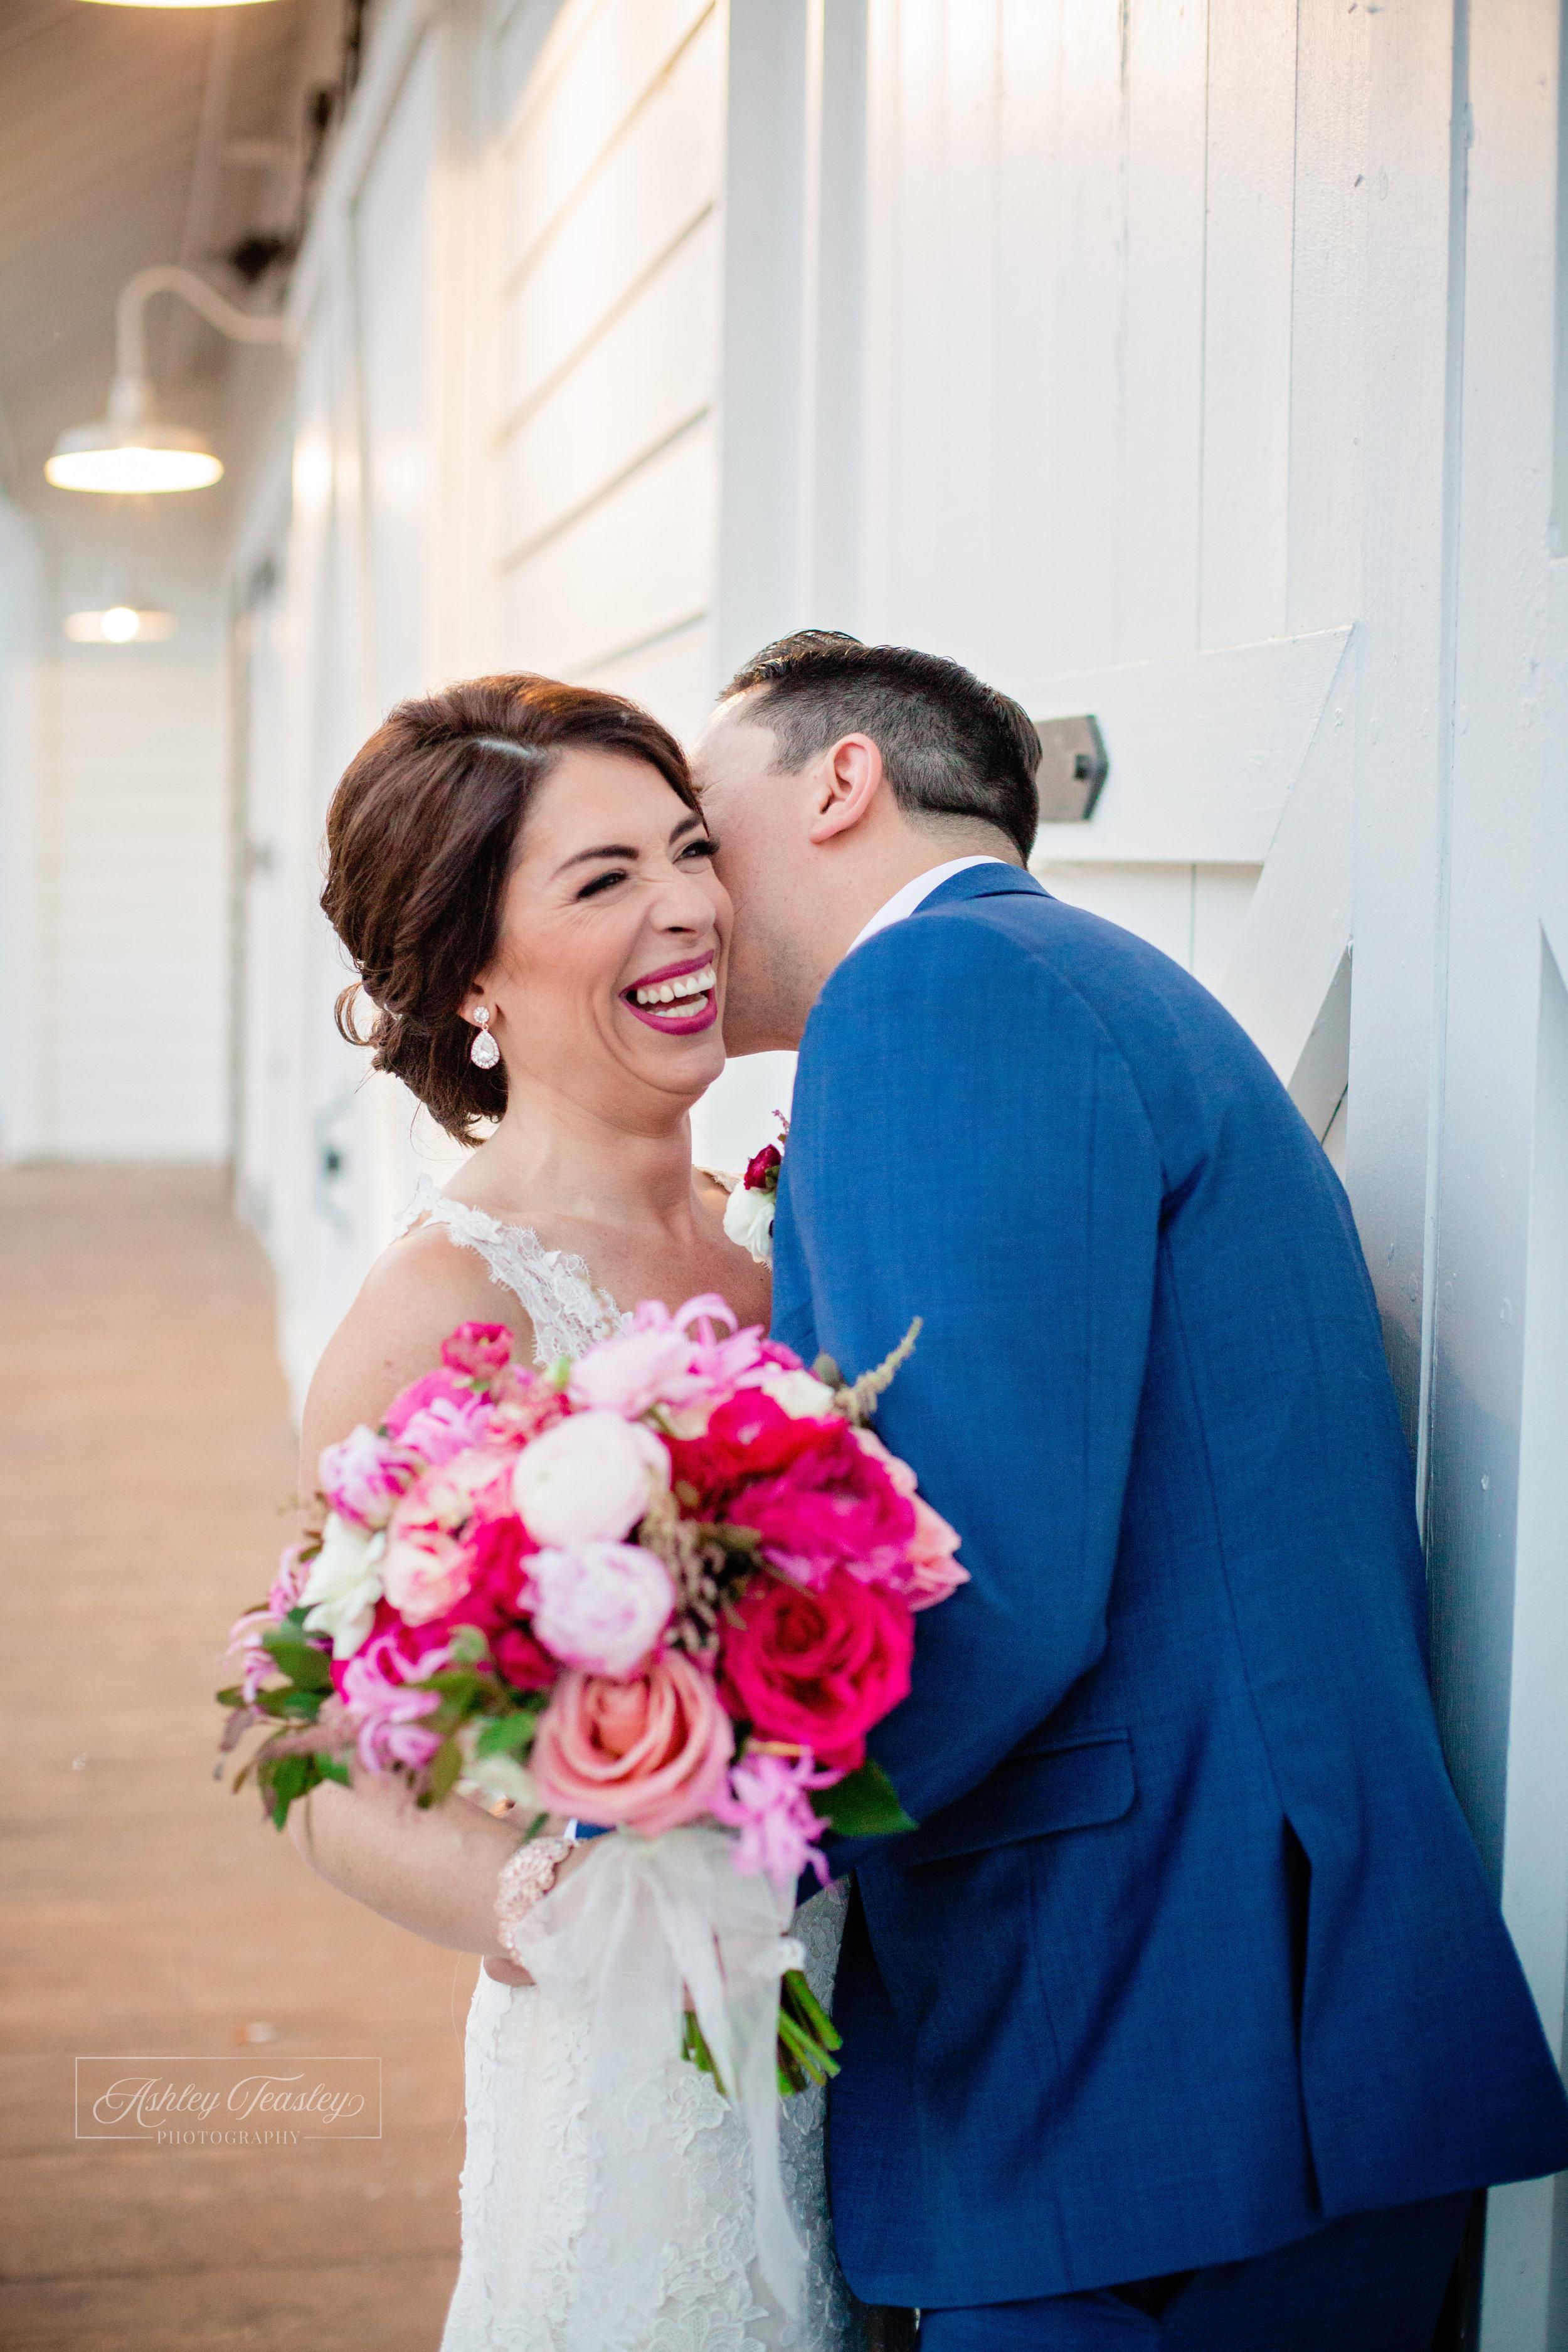 Tarrah & Francisco - The Kimpton Sawyer Hotel - The Firehouse Old Sac - Sacramento Wedding Photographer - Ashley Teasley Photography (95 of 118).jpg